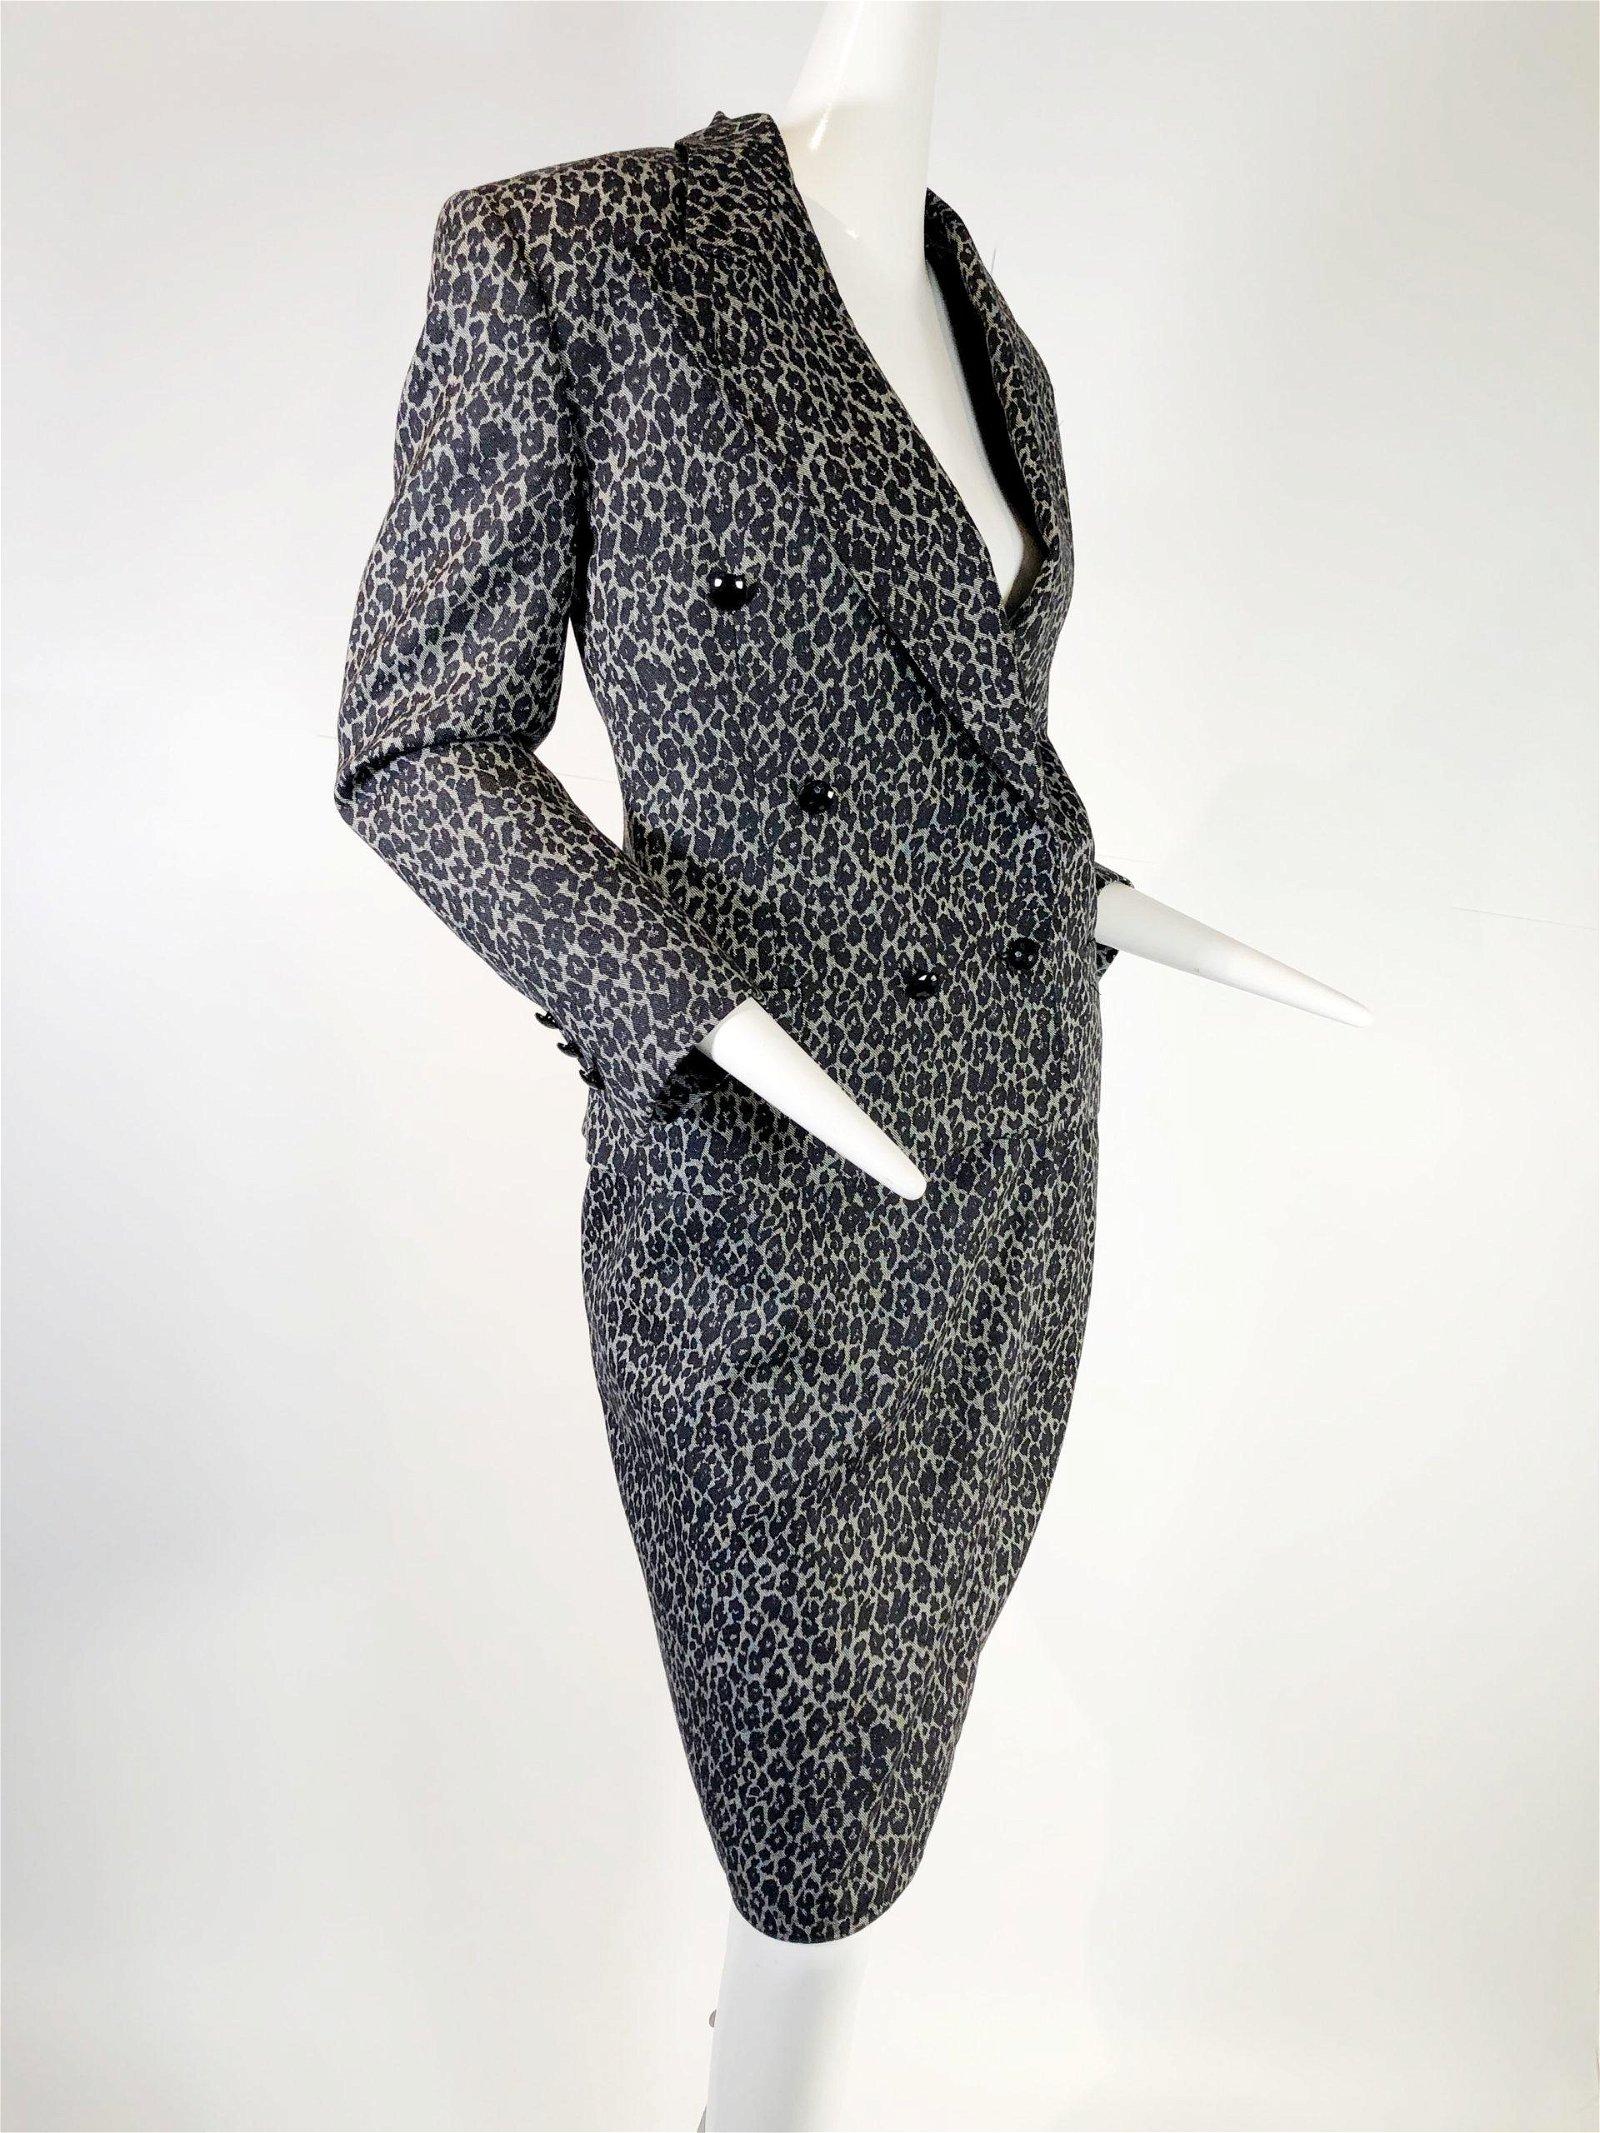 1980 Gianni Versace Grey Leopard Wool Skirt Suit